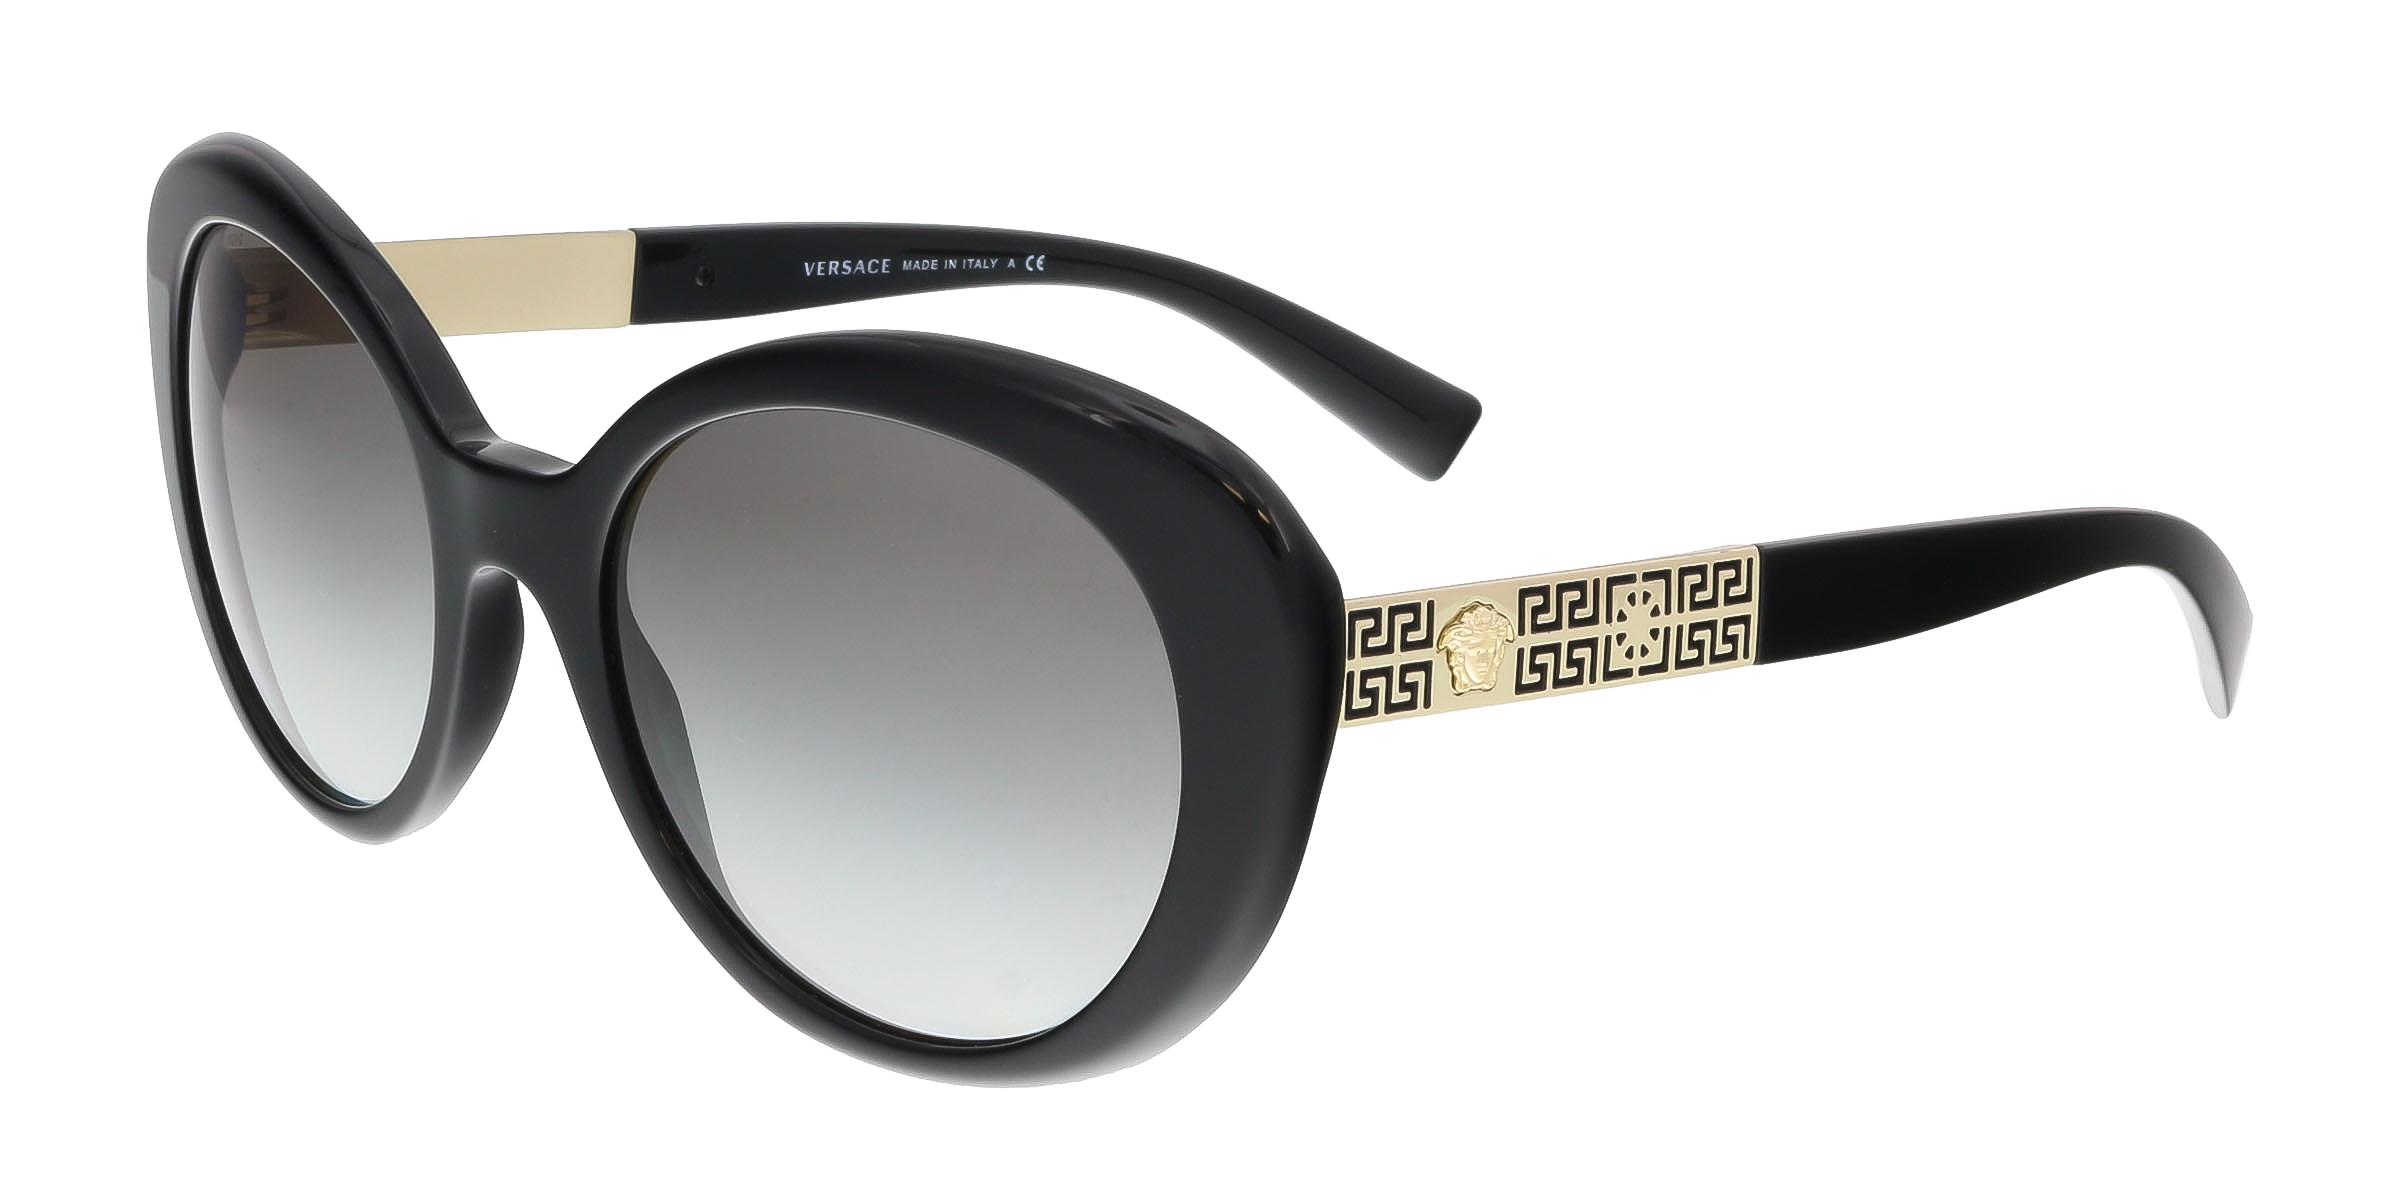 Versace VE4318 GB1/11 Black Oval Sunglasses